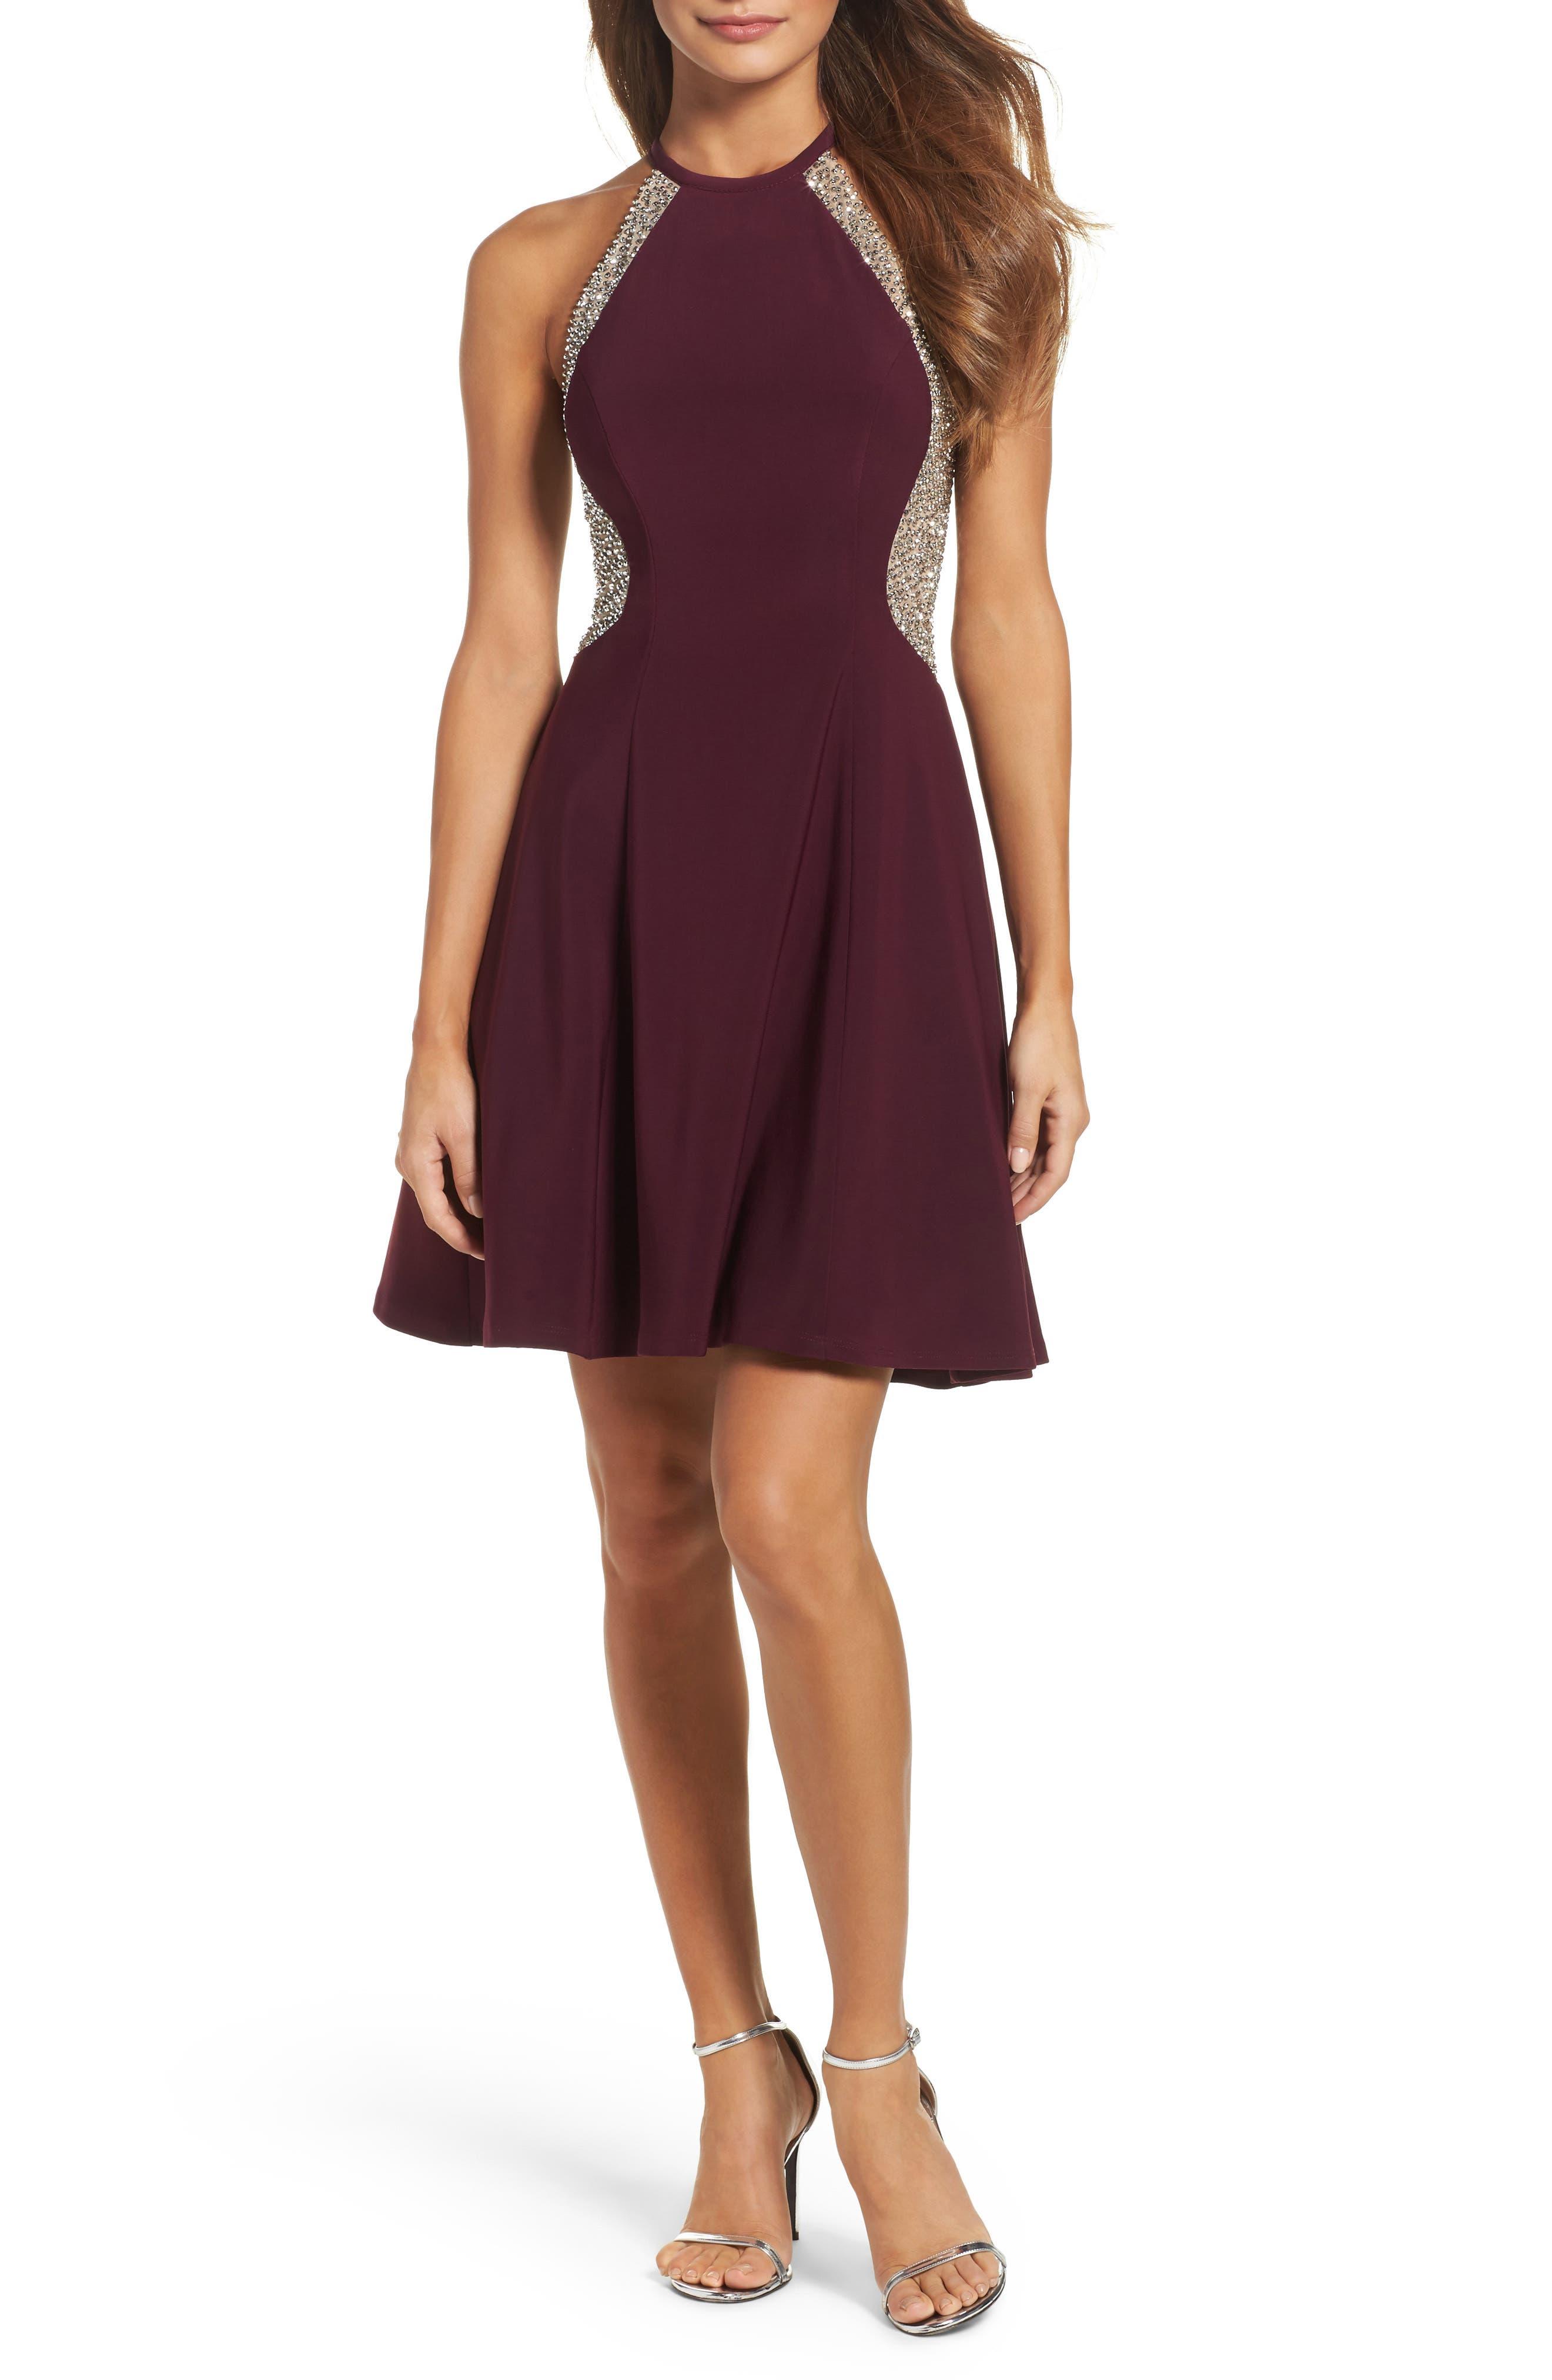 Main Image - Xscape Beaded Jersey Party Dress